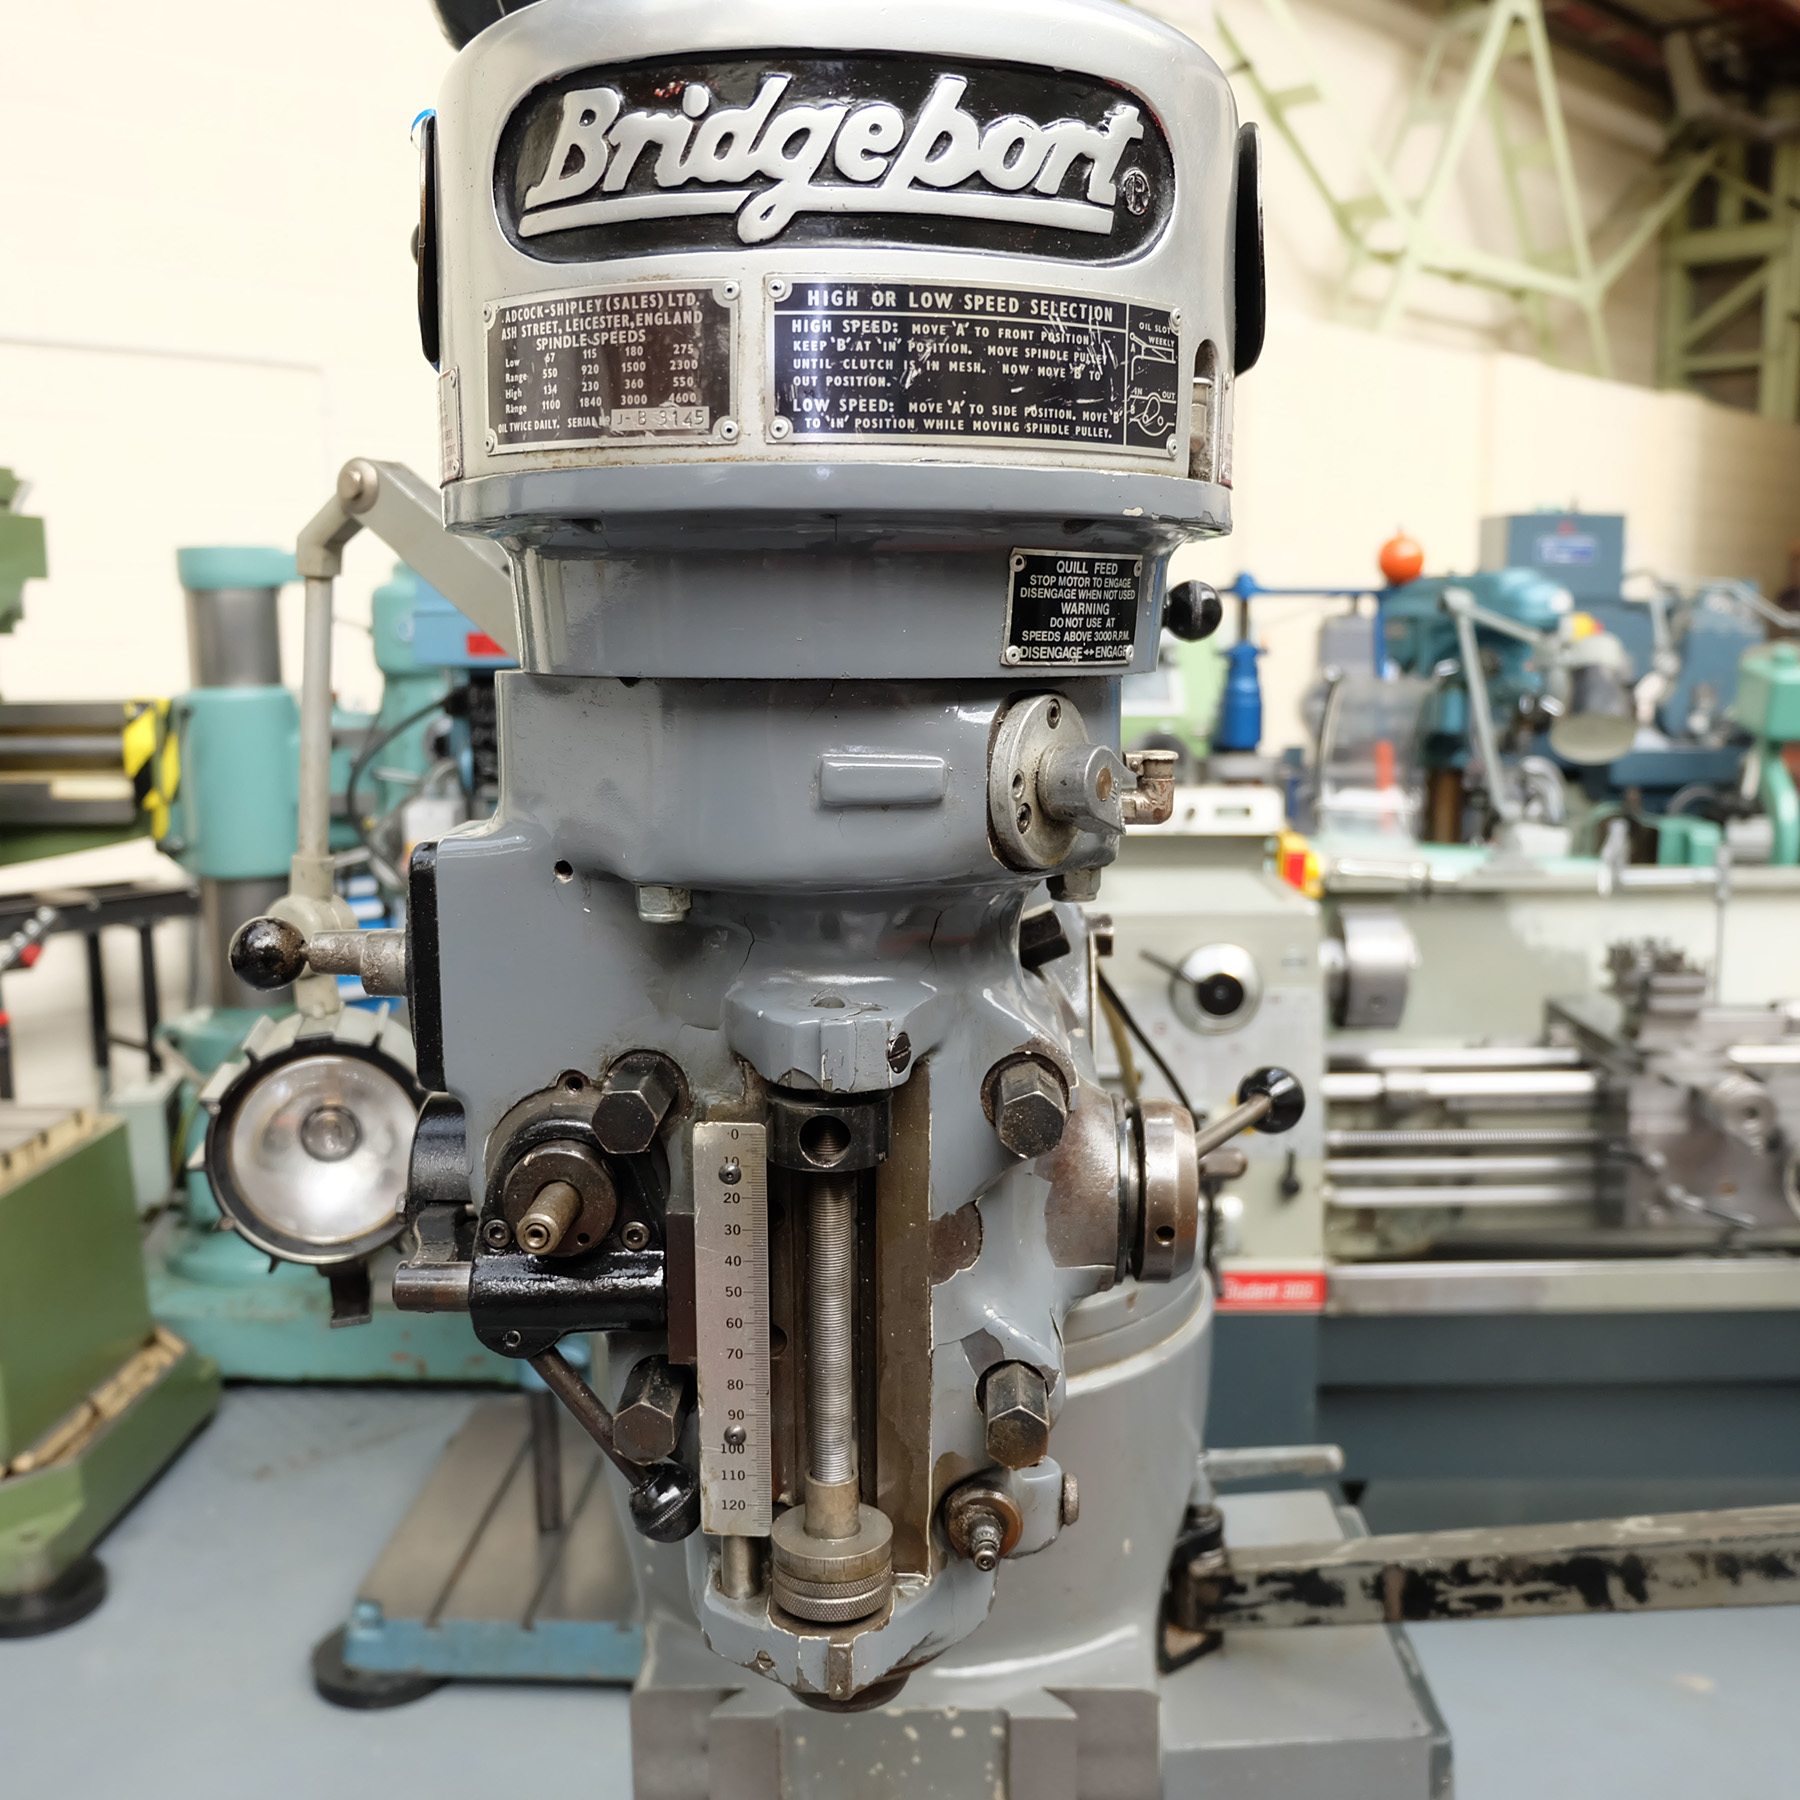 "Bridgeport J Type Turret Miller. Table Size 42"" x 9"". - Image 5 of 13"